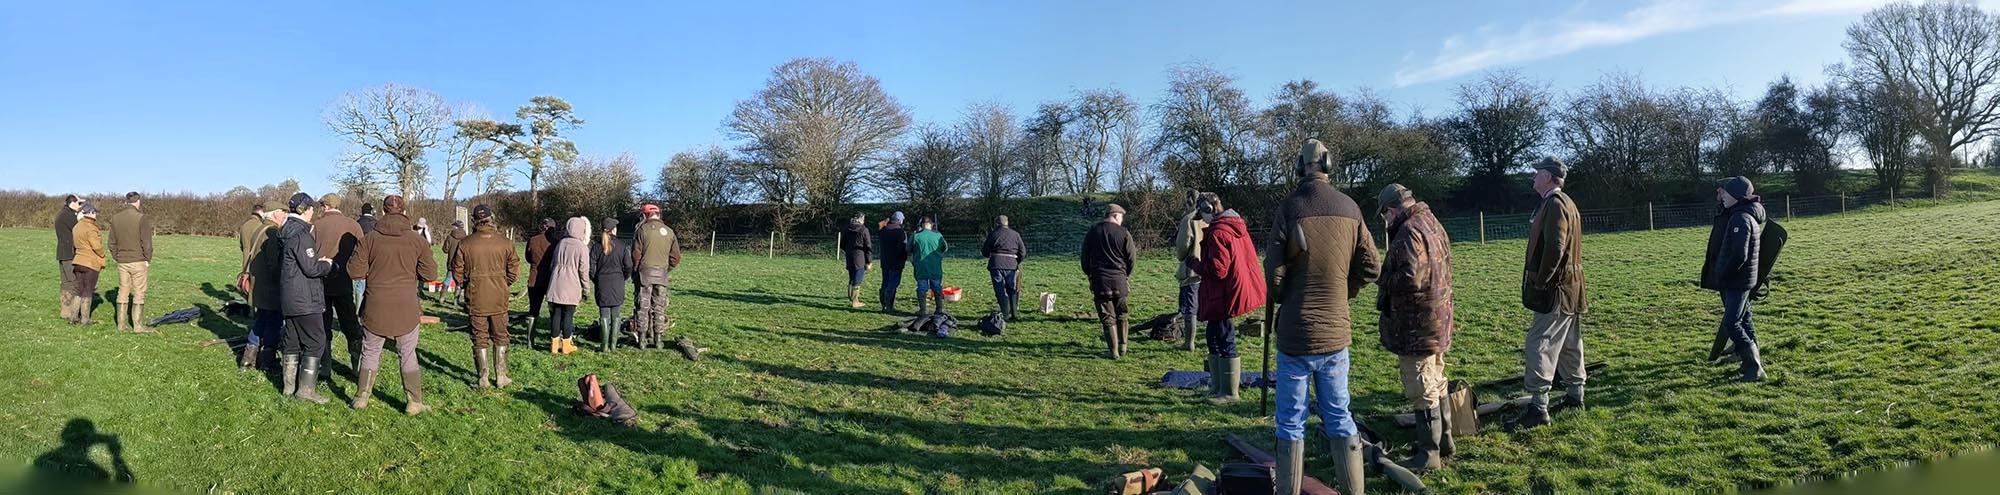 Quainton Shooting ground